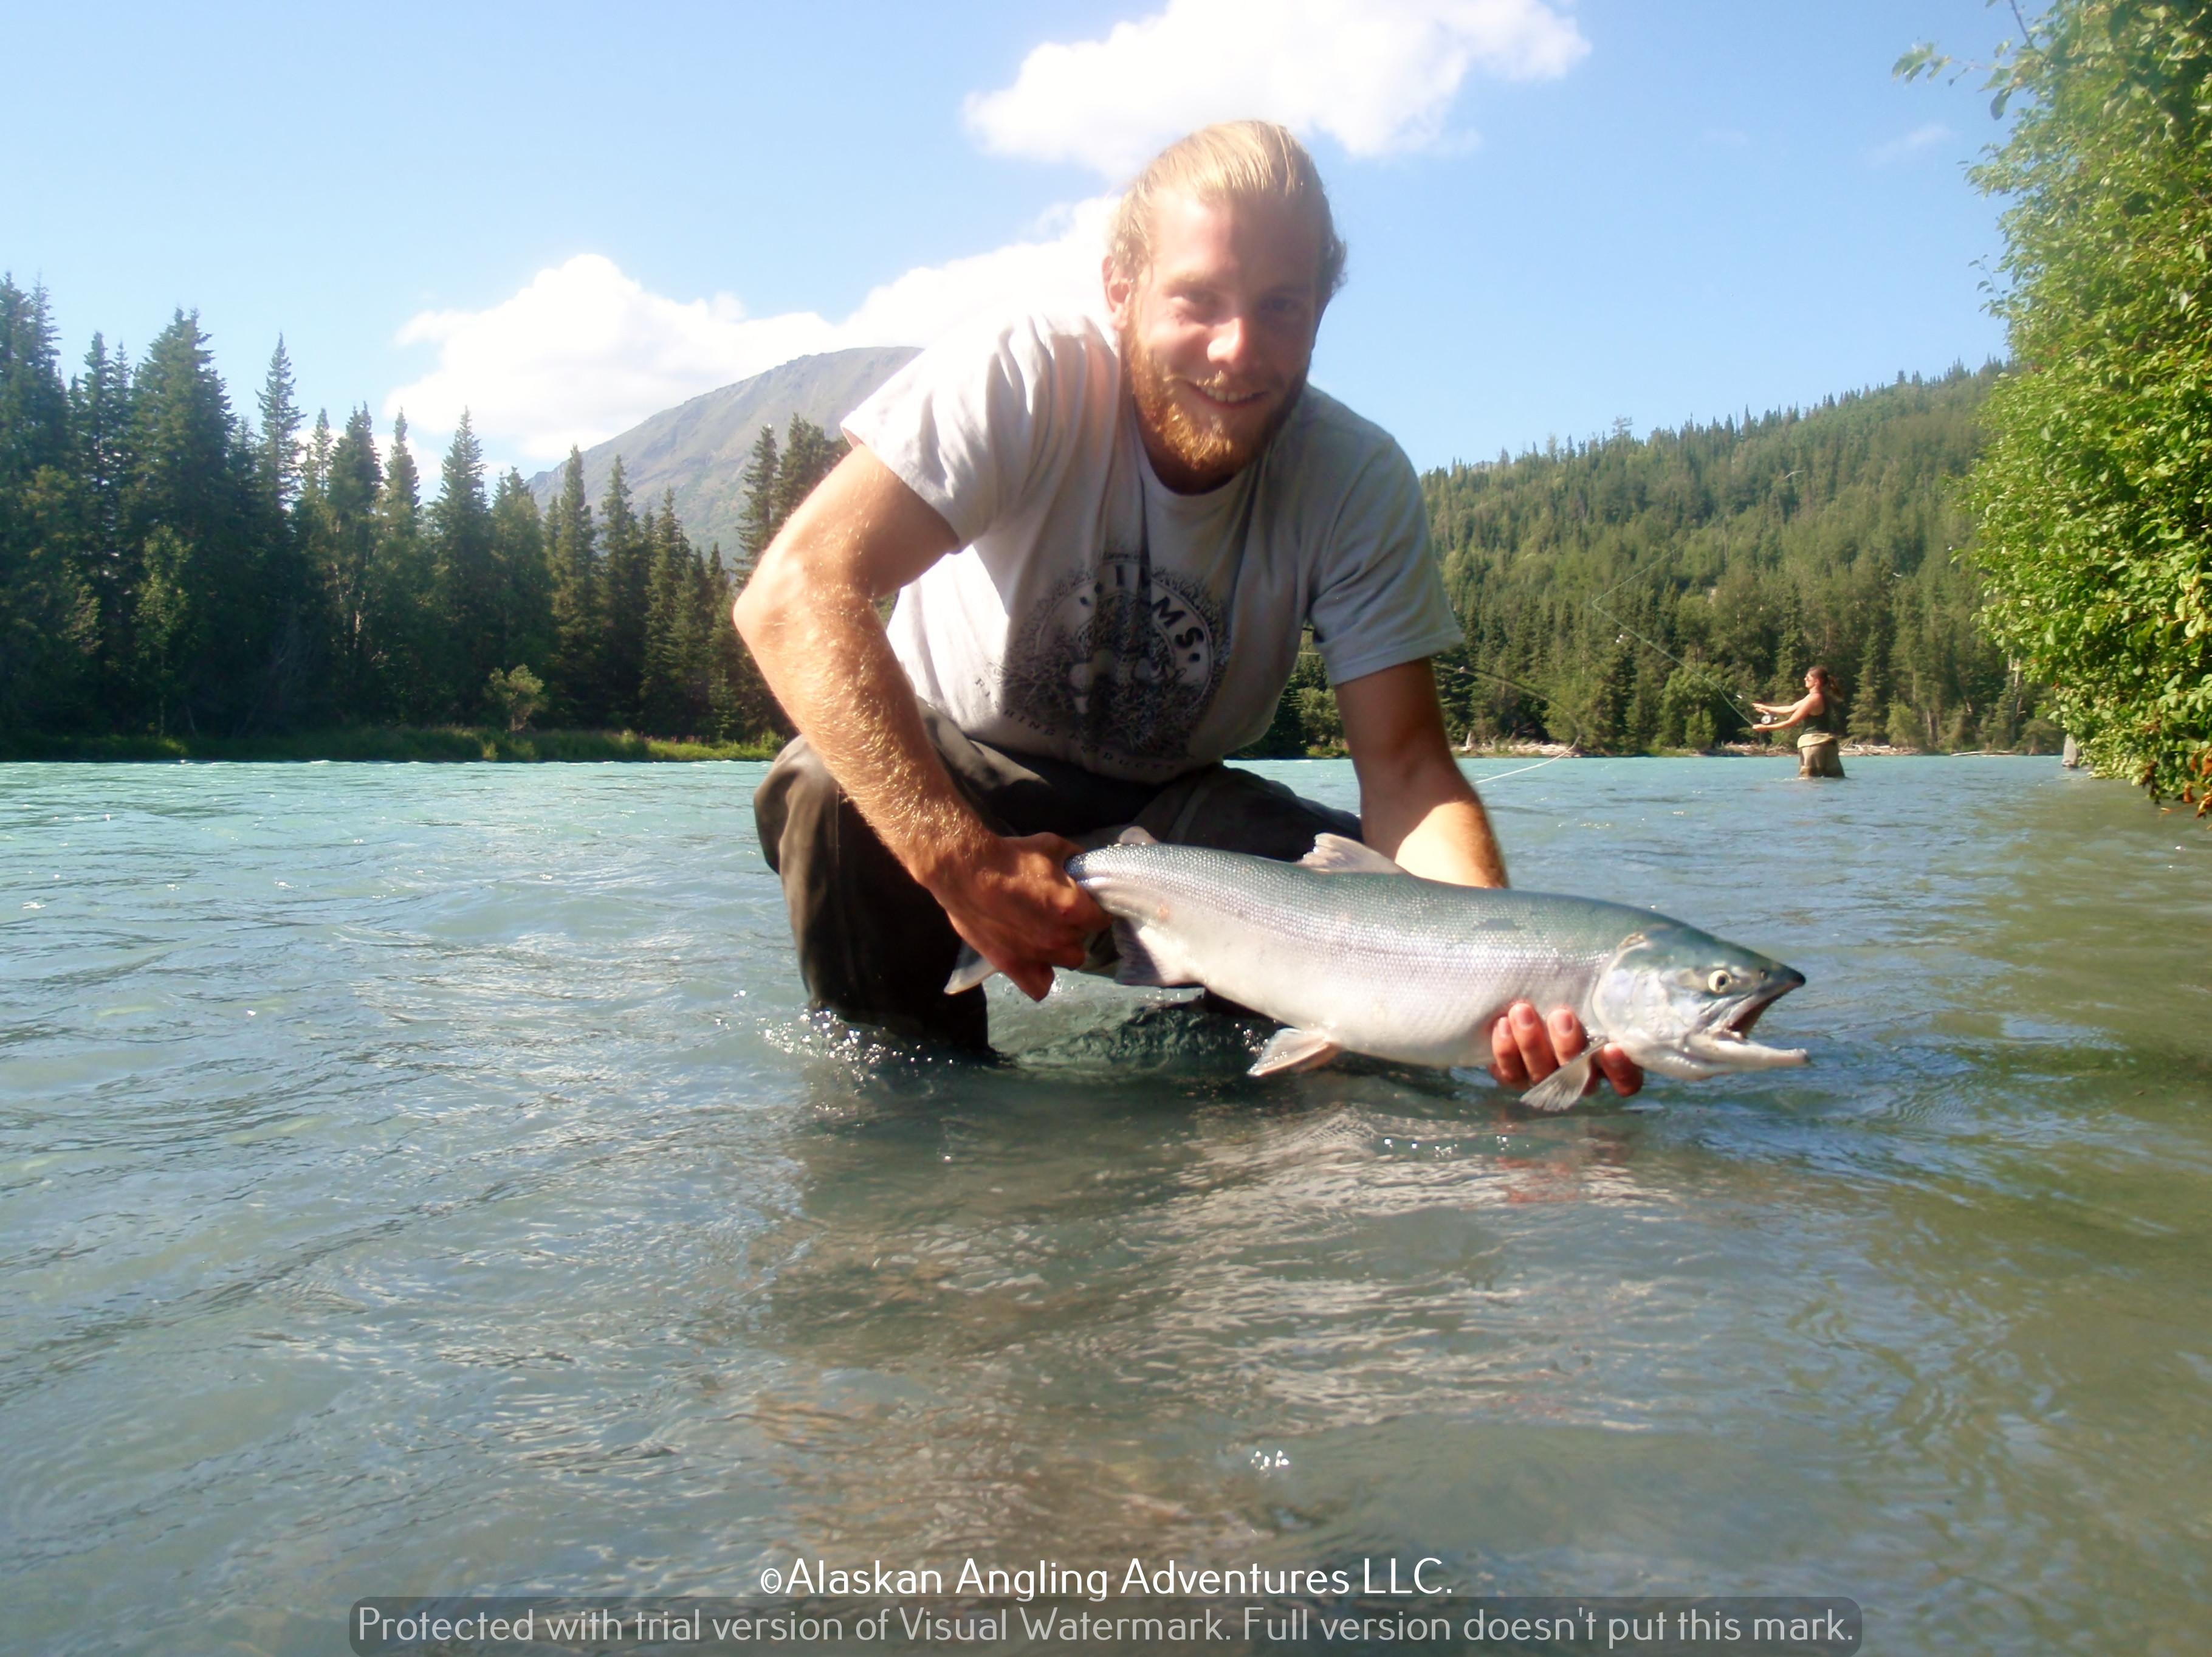 Alaskan Angling Adventures Llc.: Full Day Upper Kenai RiverFishing Trip